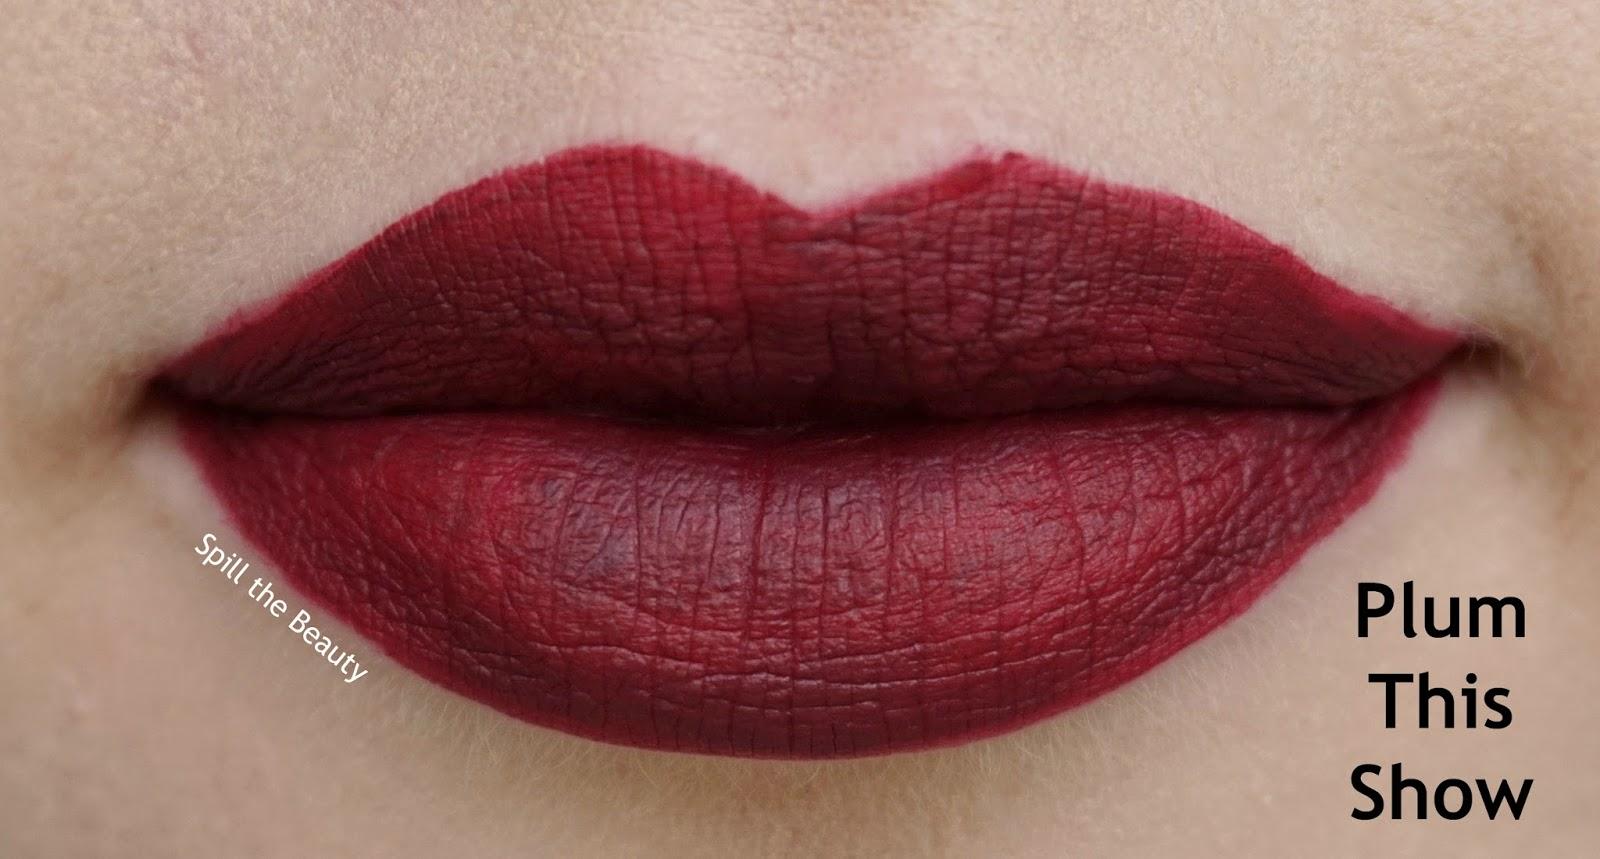 rimmel london stay matte liquid lip color review swatches 810 plum this show